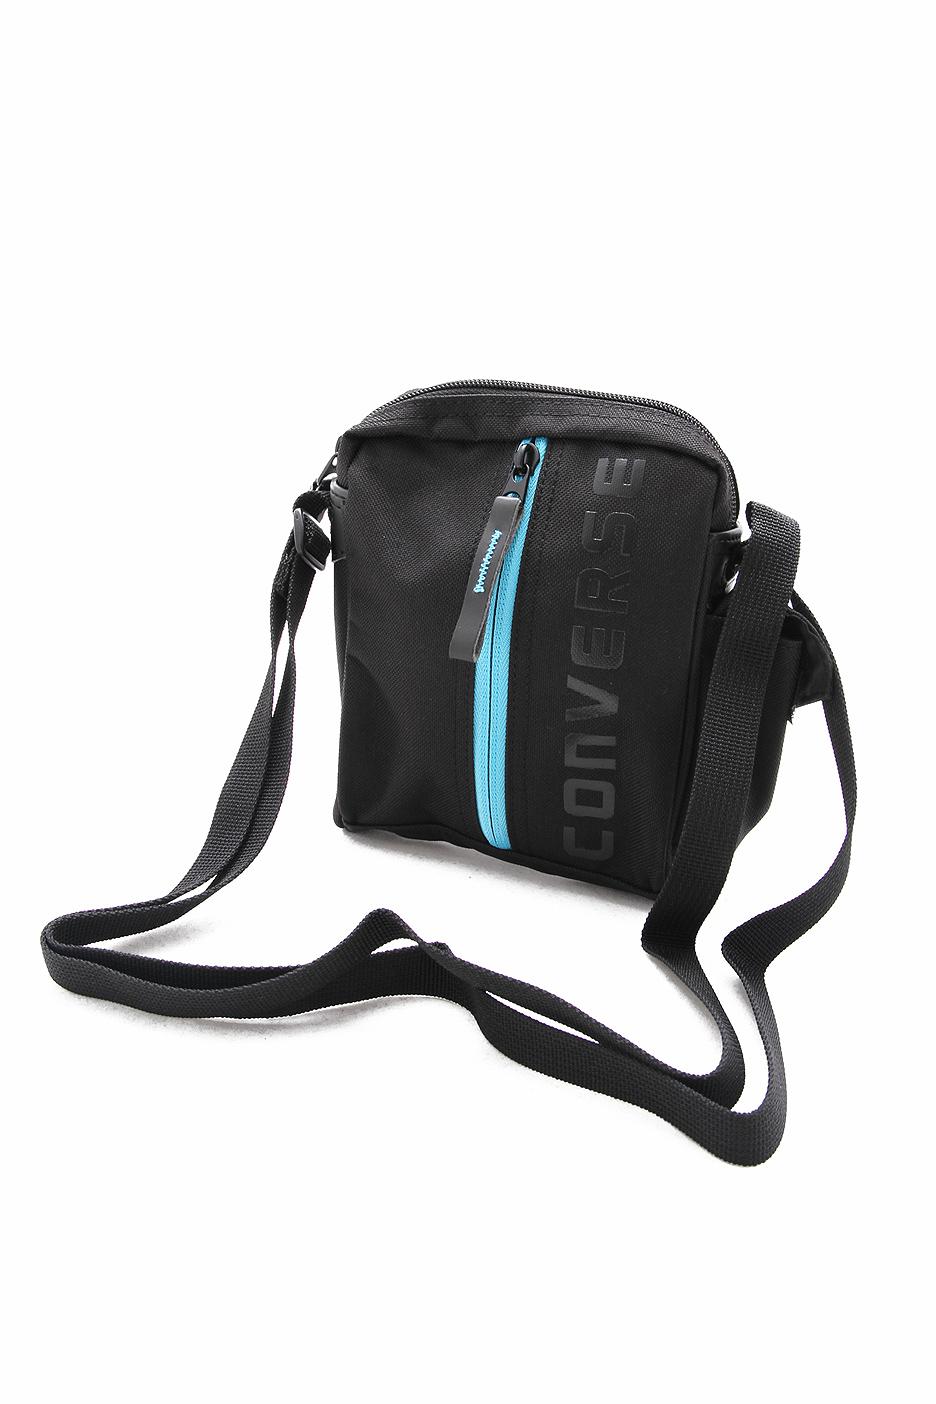 Converse - N-Trainner - Bag - Impericon.com UK 4abc17c65c